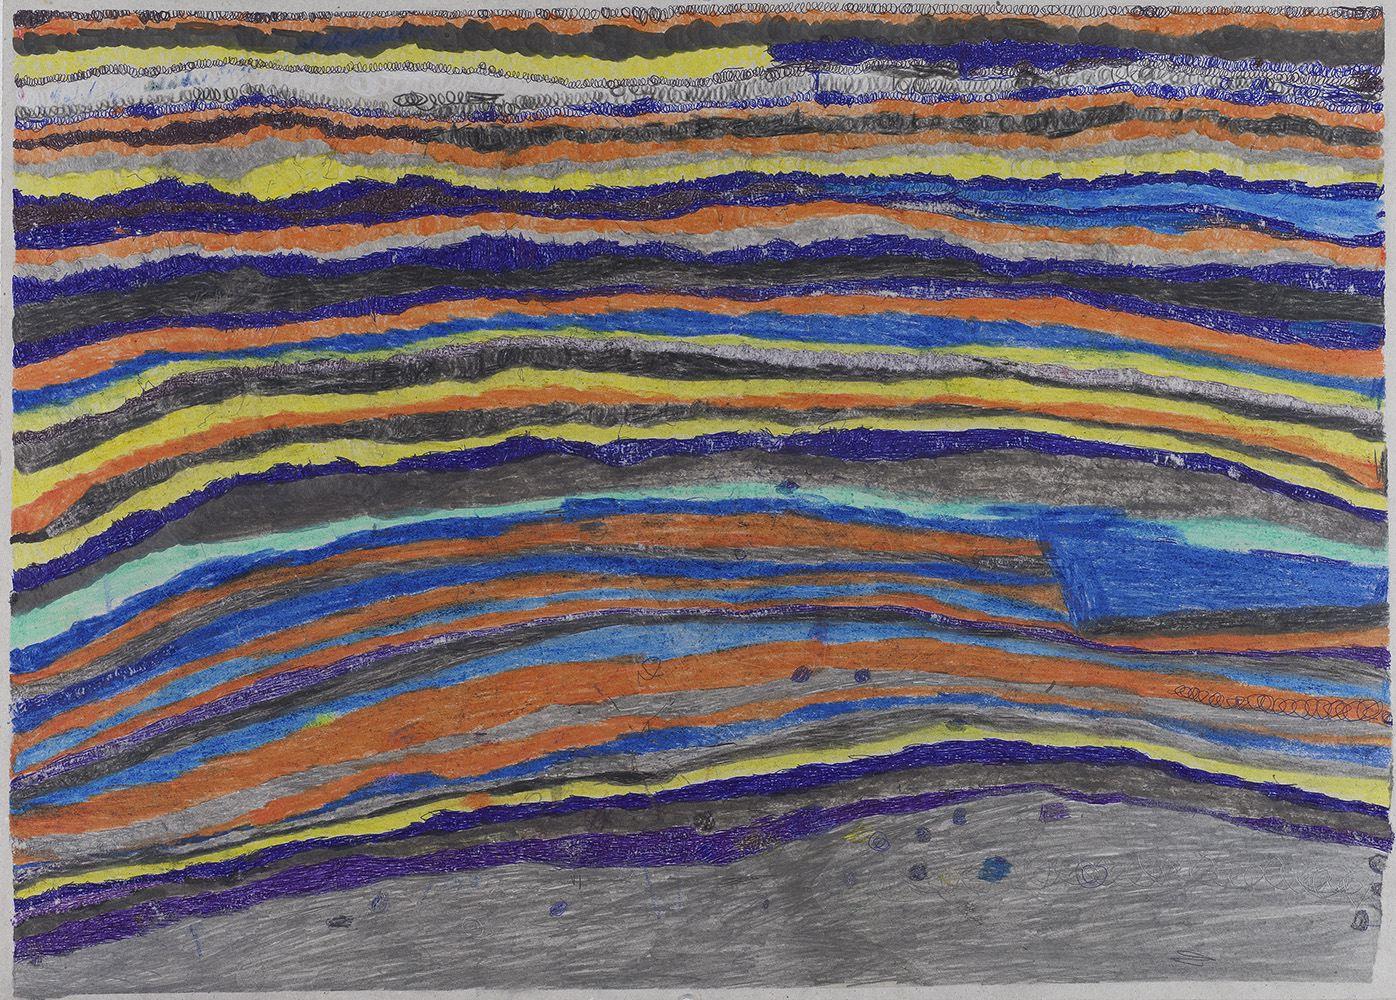 Joseph Lambert    Untitled  , 2015 Mixed media on cardboard 19.69 x 27.56 inches 50 x 70 cm JLam 6